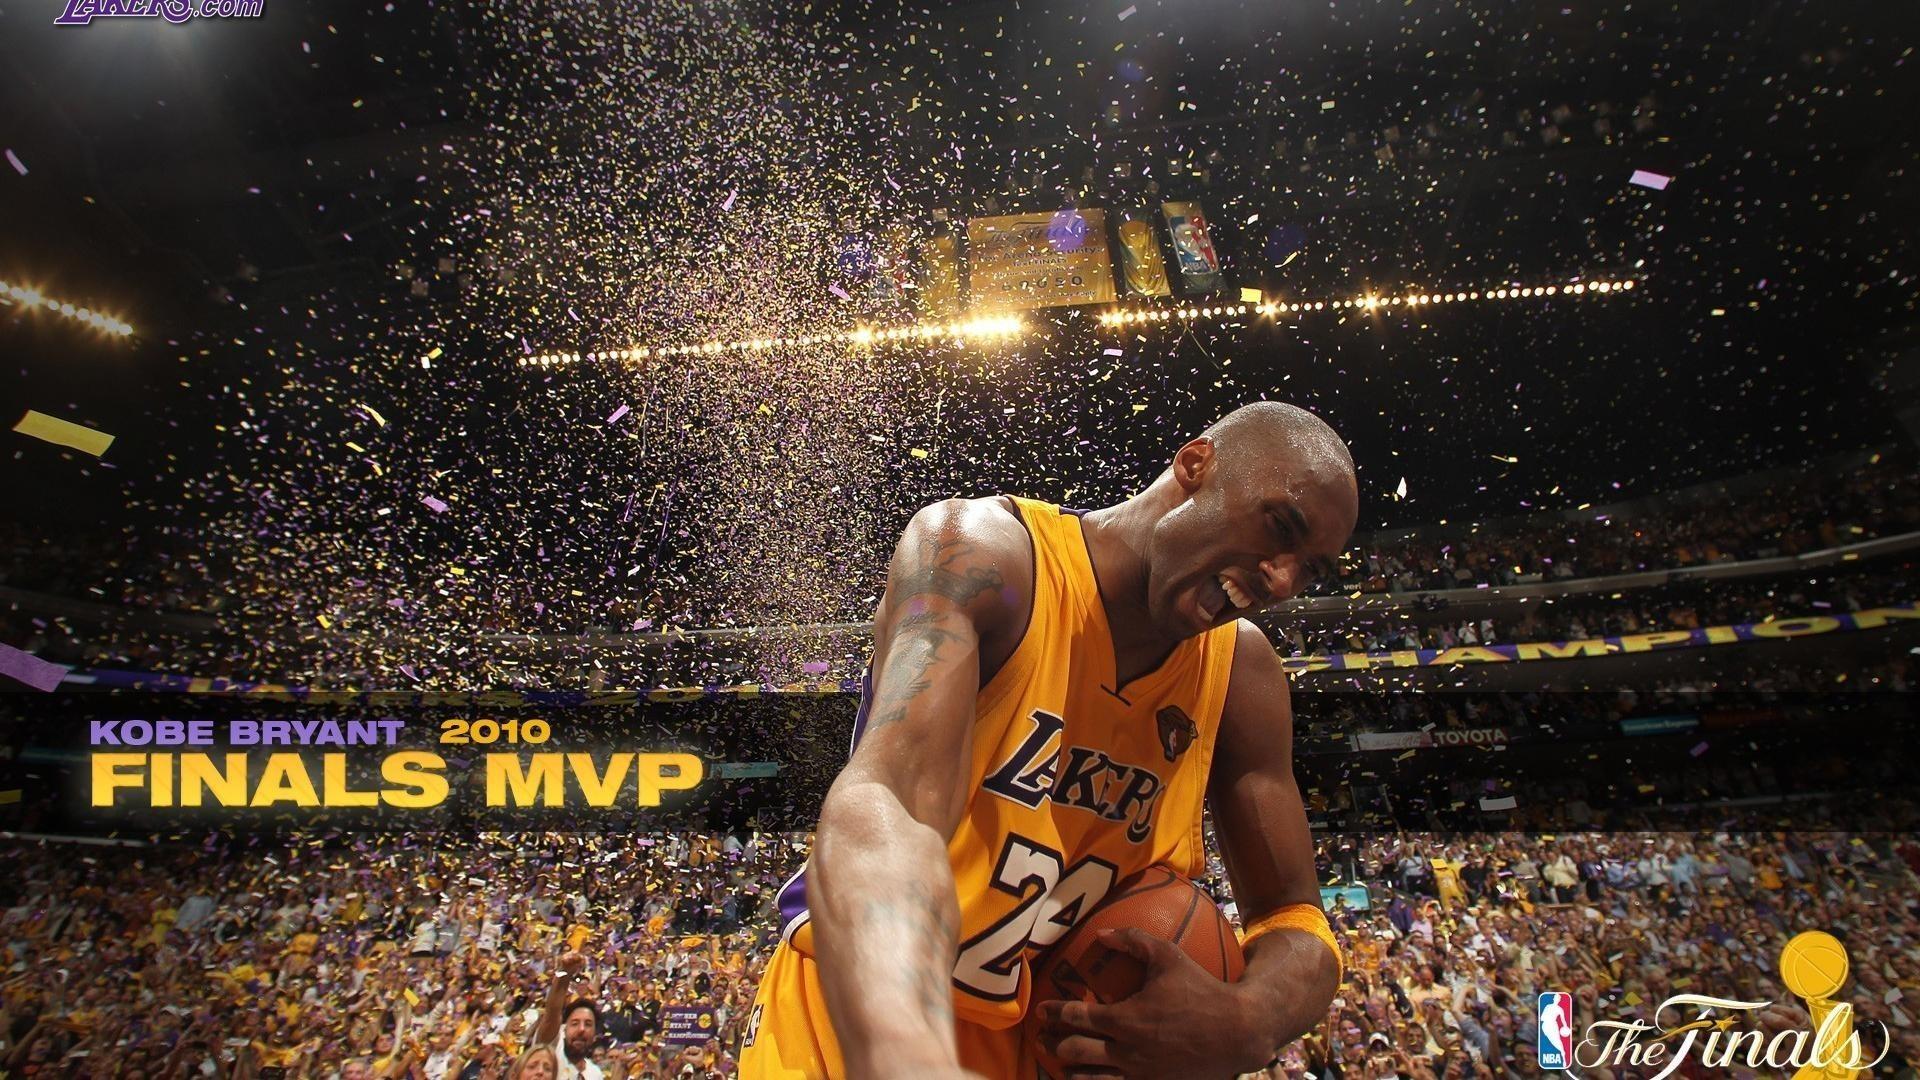 Kobe bryant los angeles lakers athletes celebrity championship wallpaper